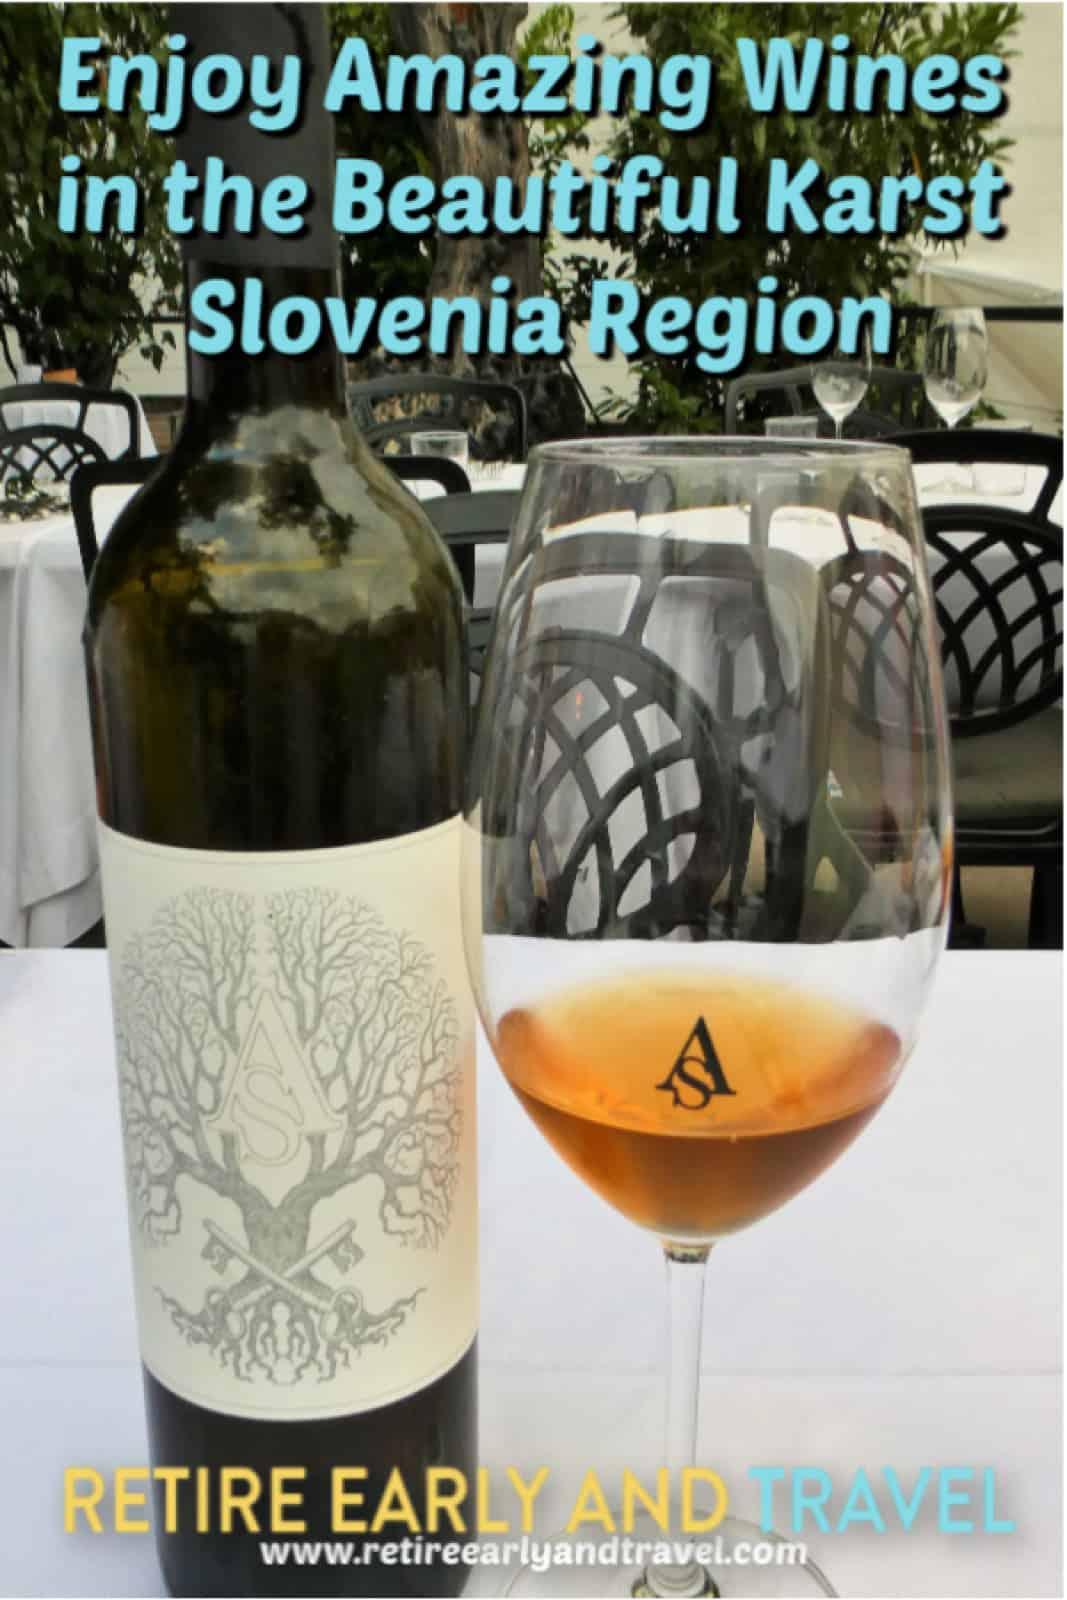 Karst Slovenia